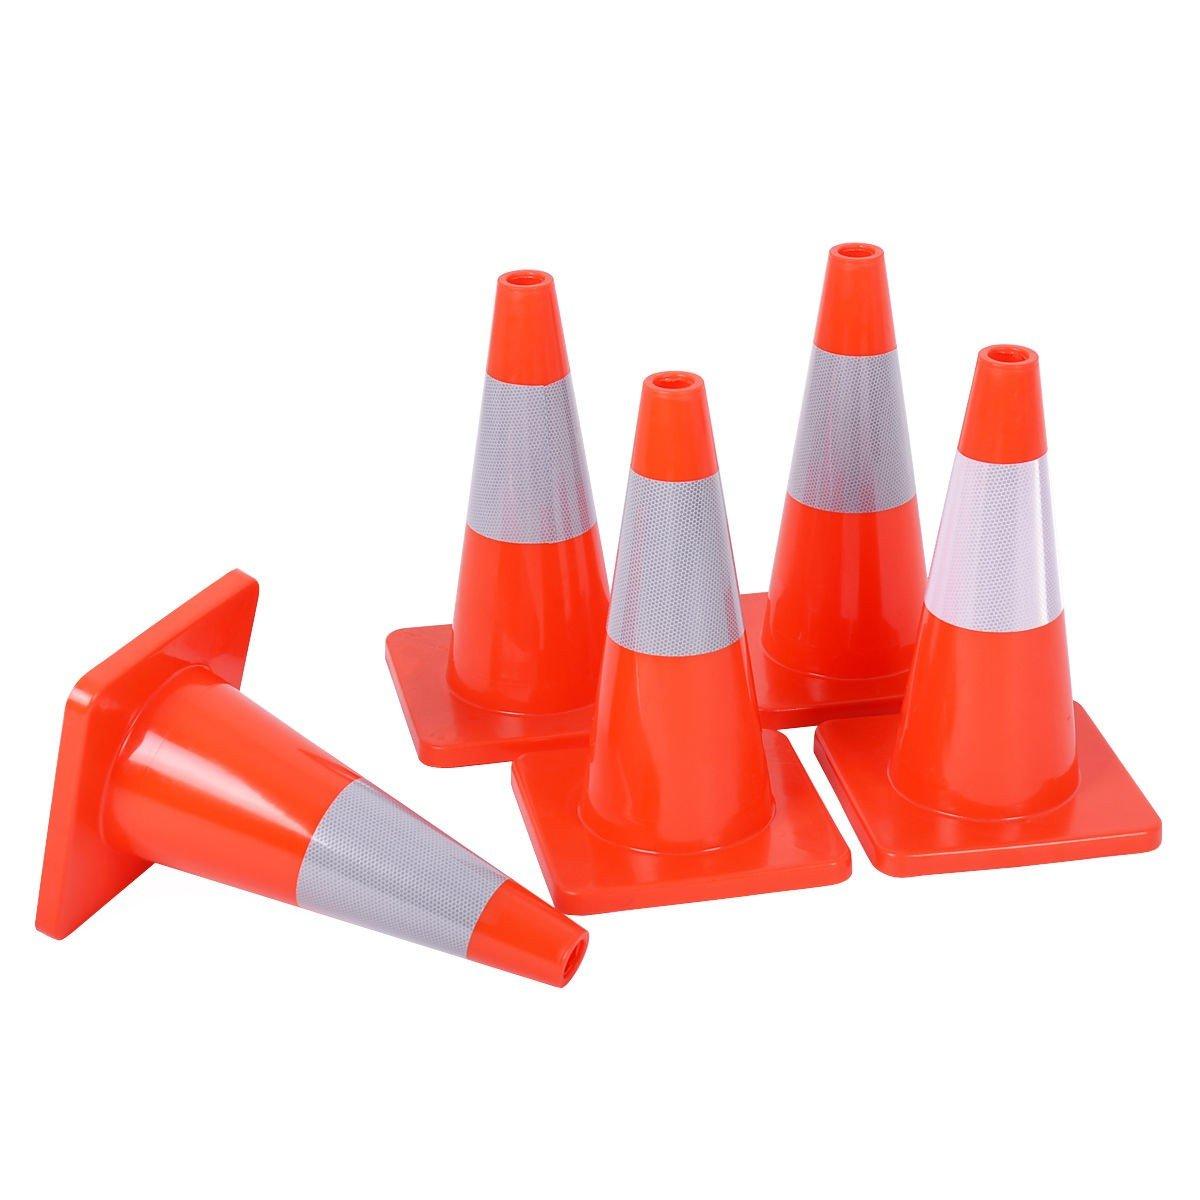 5 pcs 18'' Slim Fluorescent Safety Parking Traffic Cones